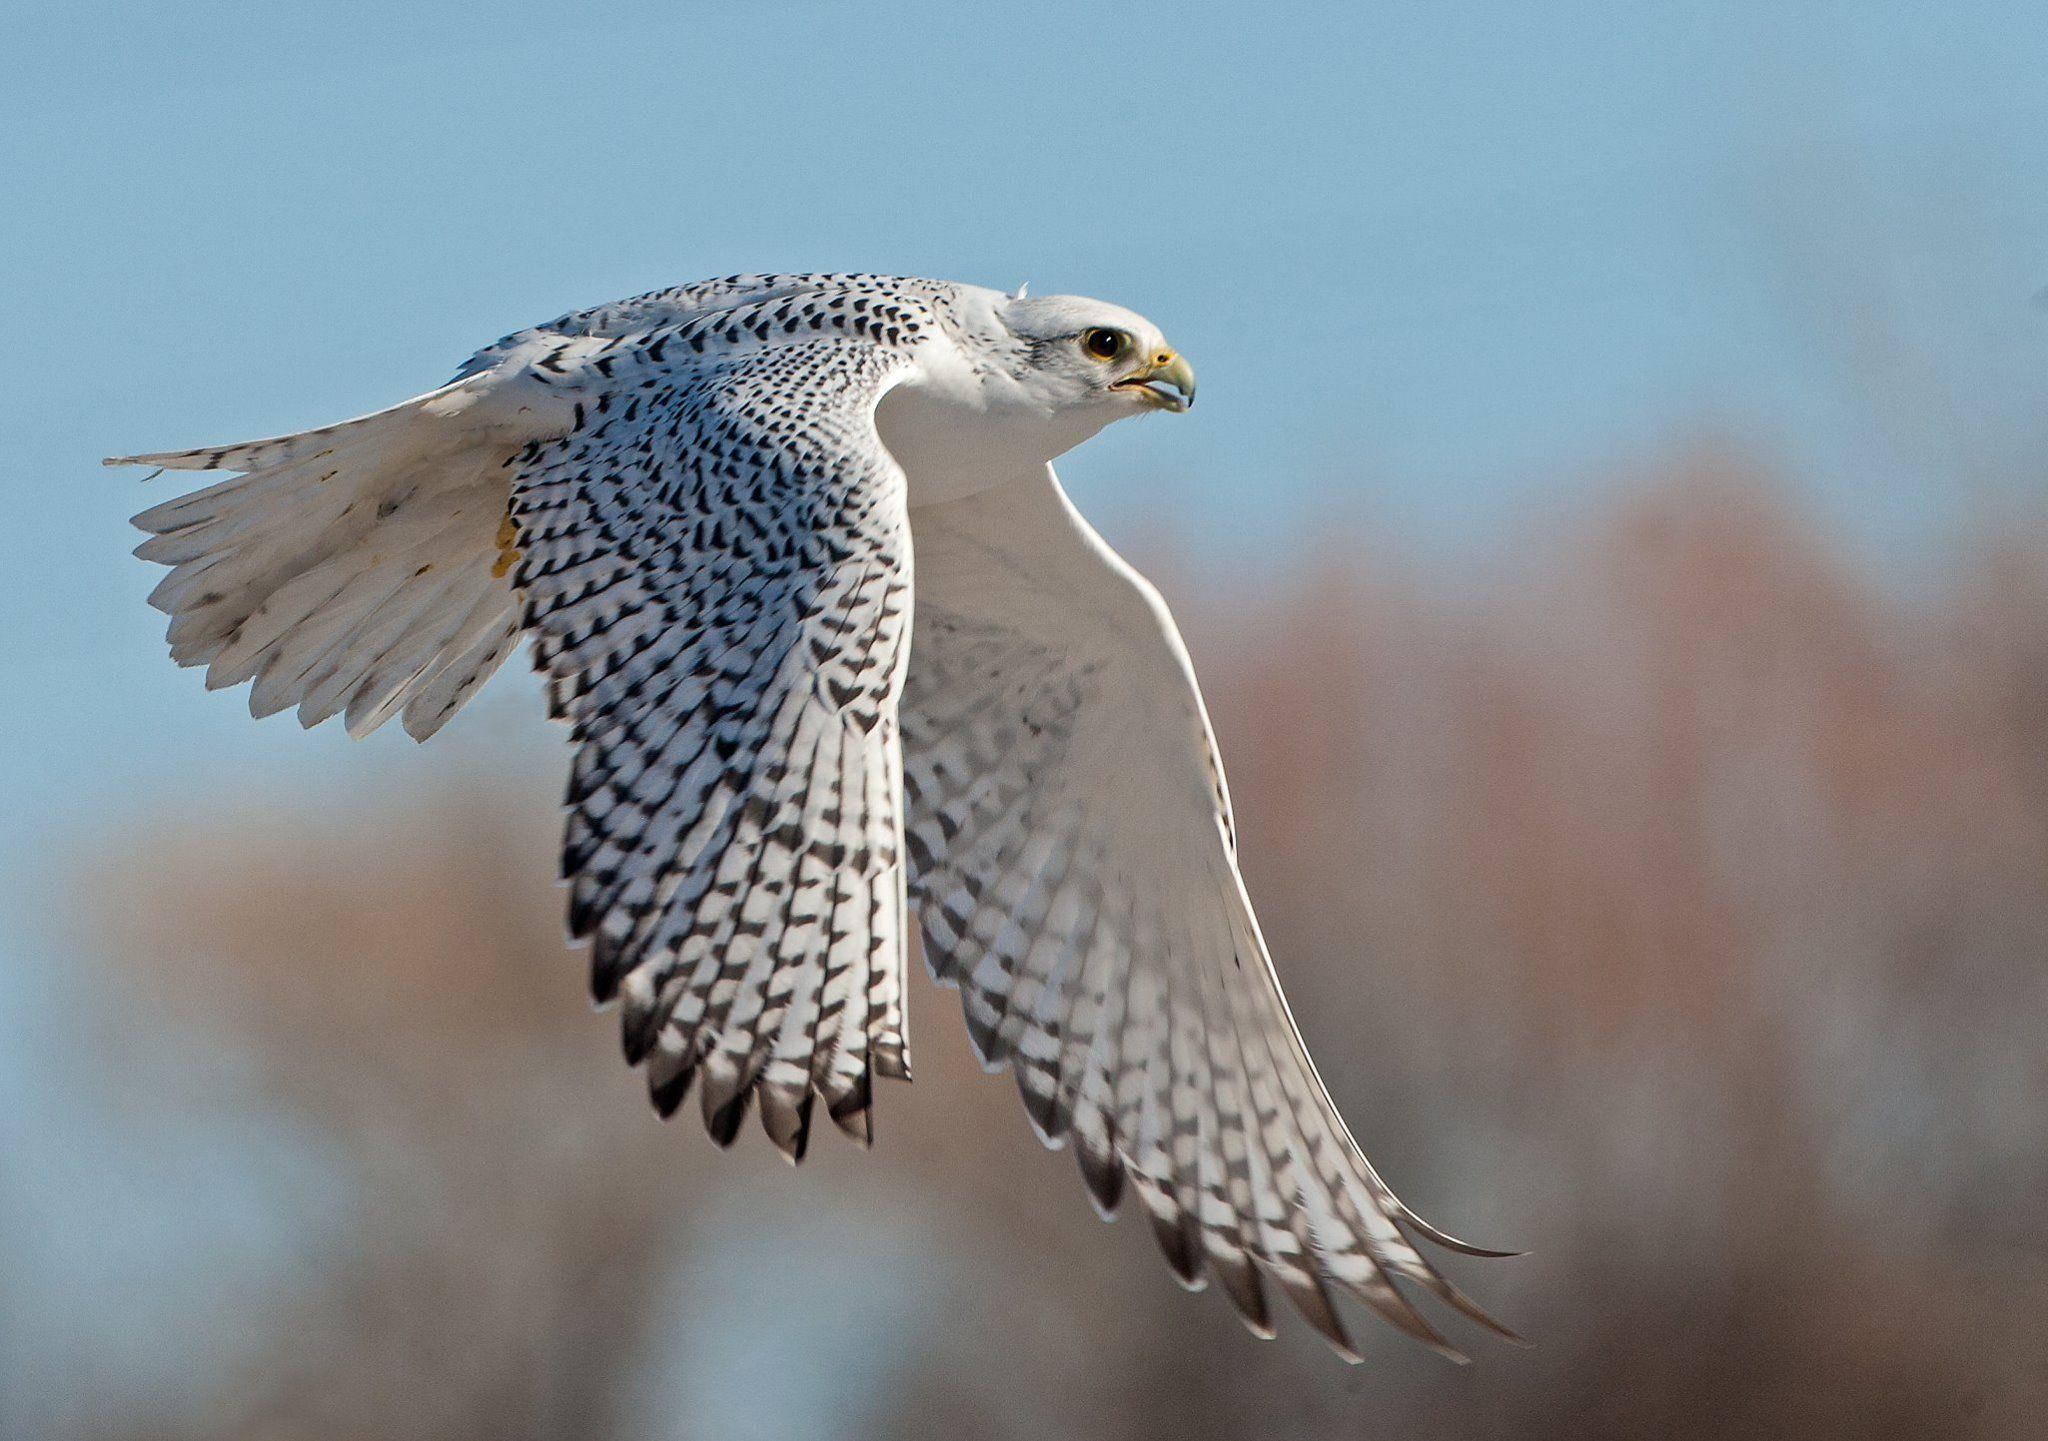 Adult White Gyrfalcon, a falconer's bird | Birds, Raptors ...